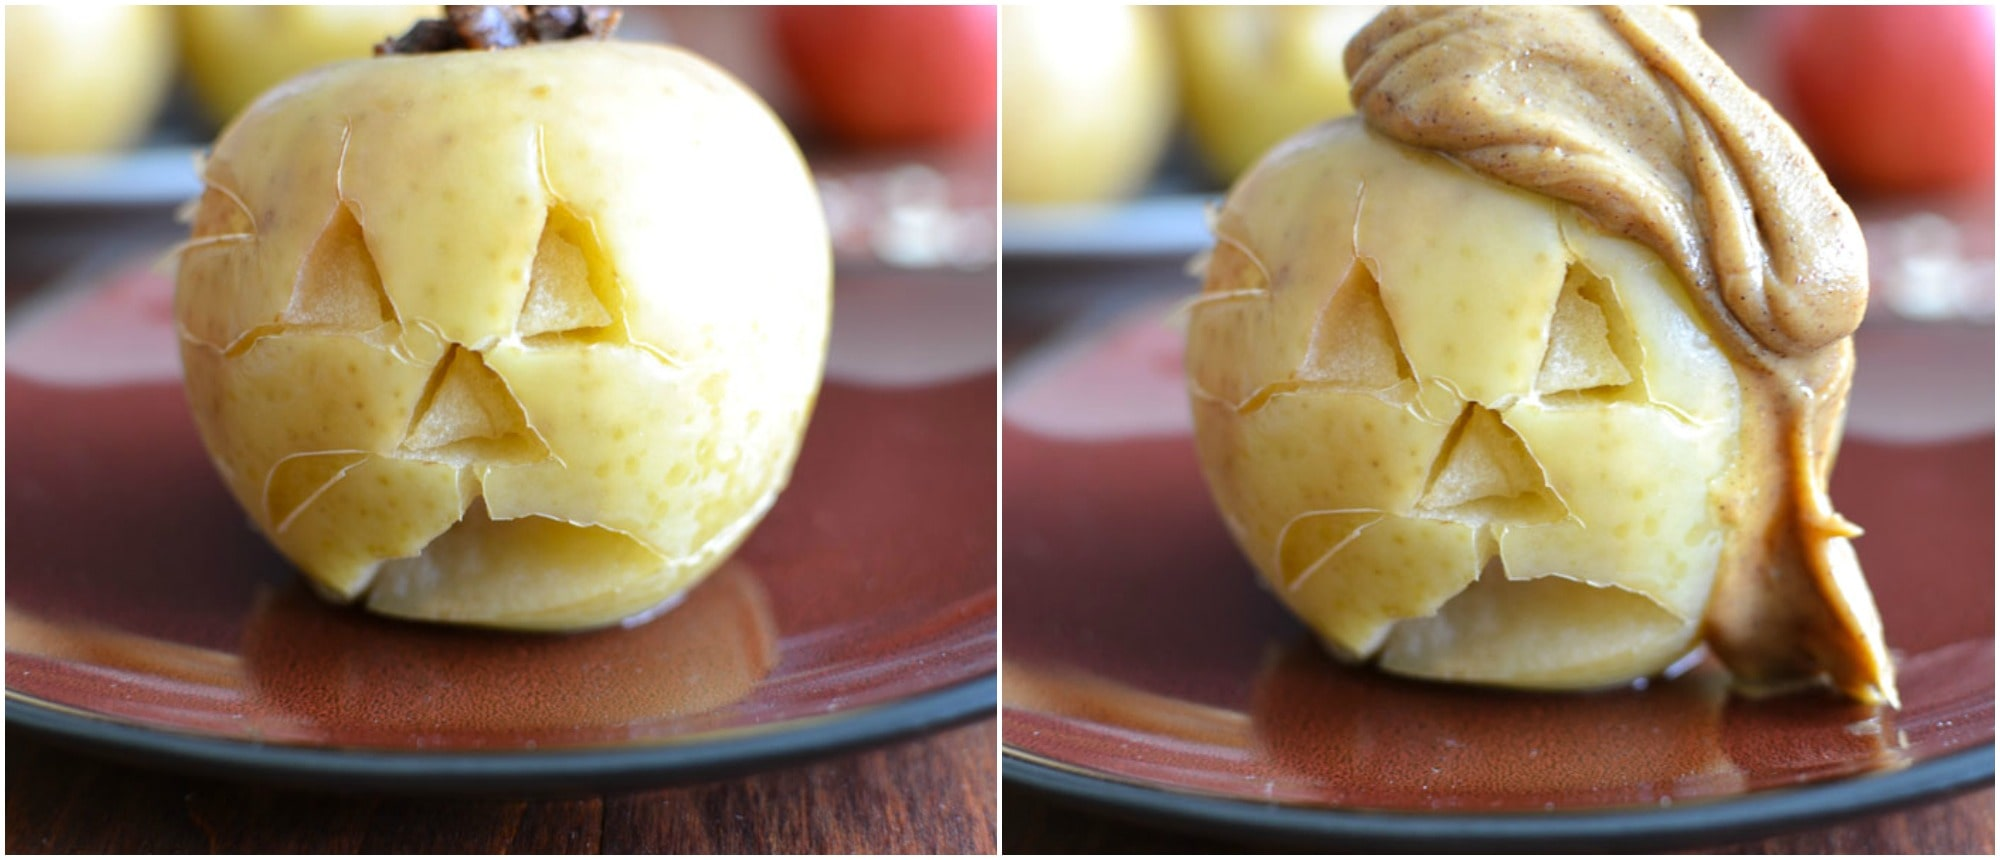 Slow-Cooker Pecan-Stuffed Apples with Cinnamon-Peanut Butter Sauce